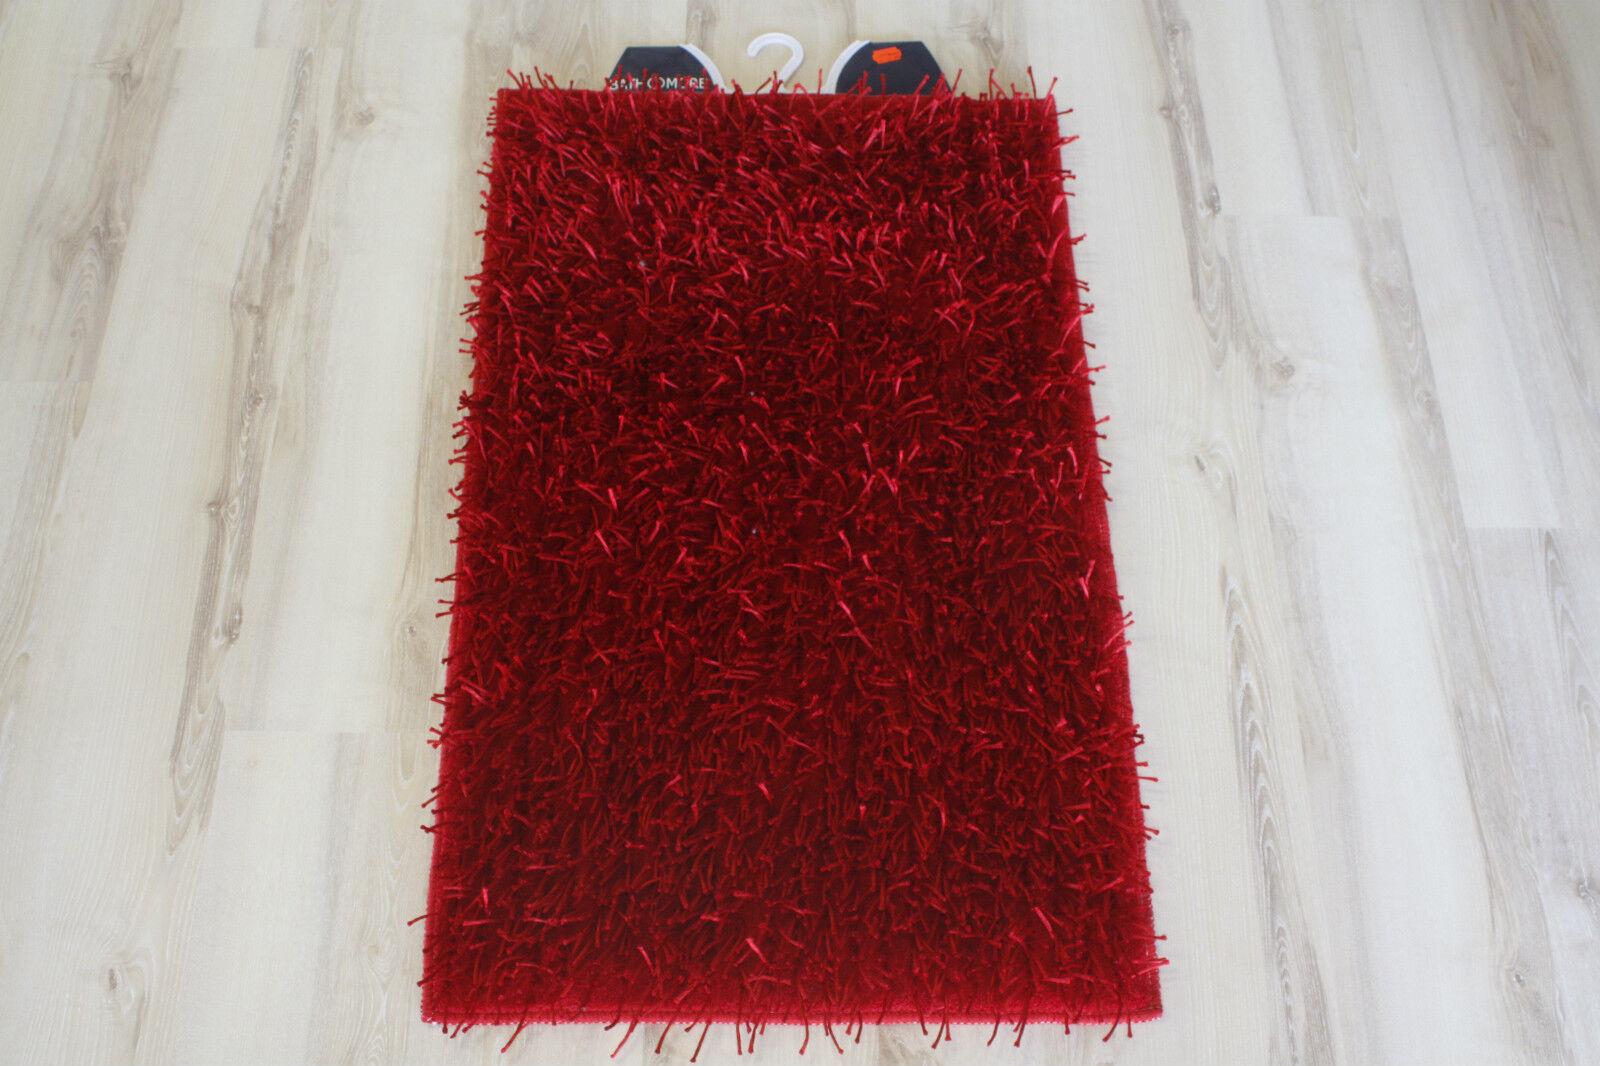 Badteppich Badematte Langflor 80x150cm Rot Mauritius